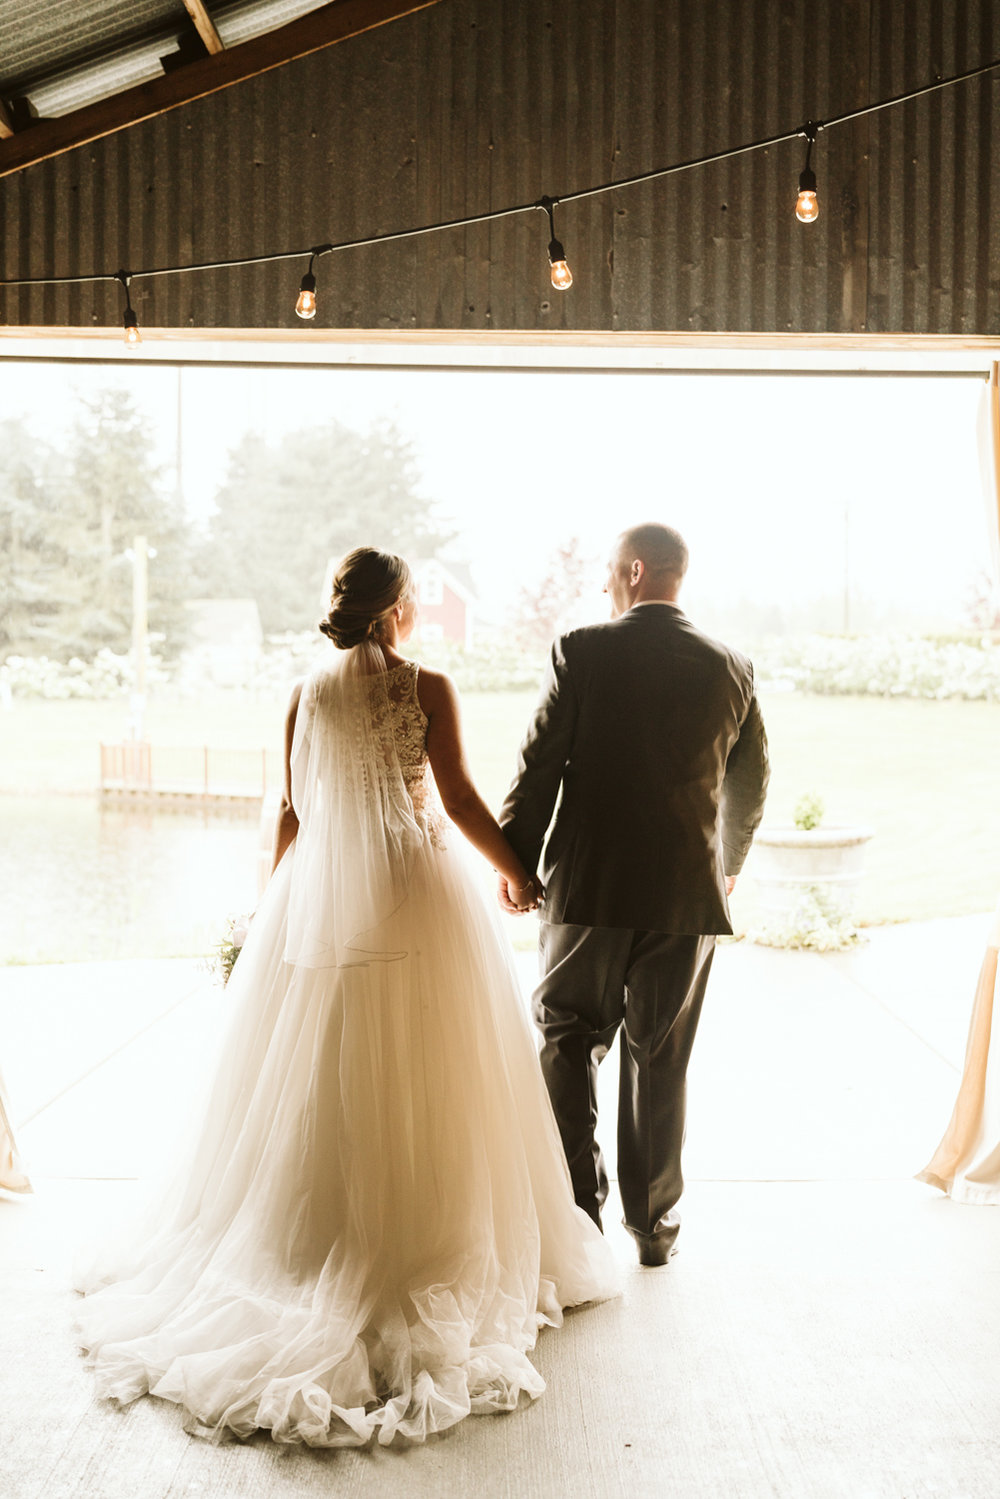 April Yentas Photography - jen and anthony wedding-64.jpg